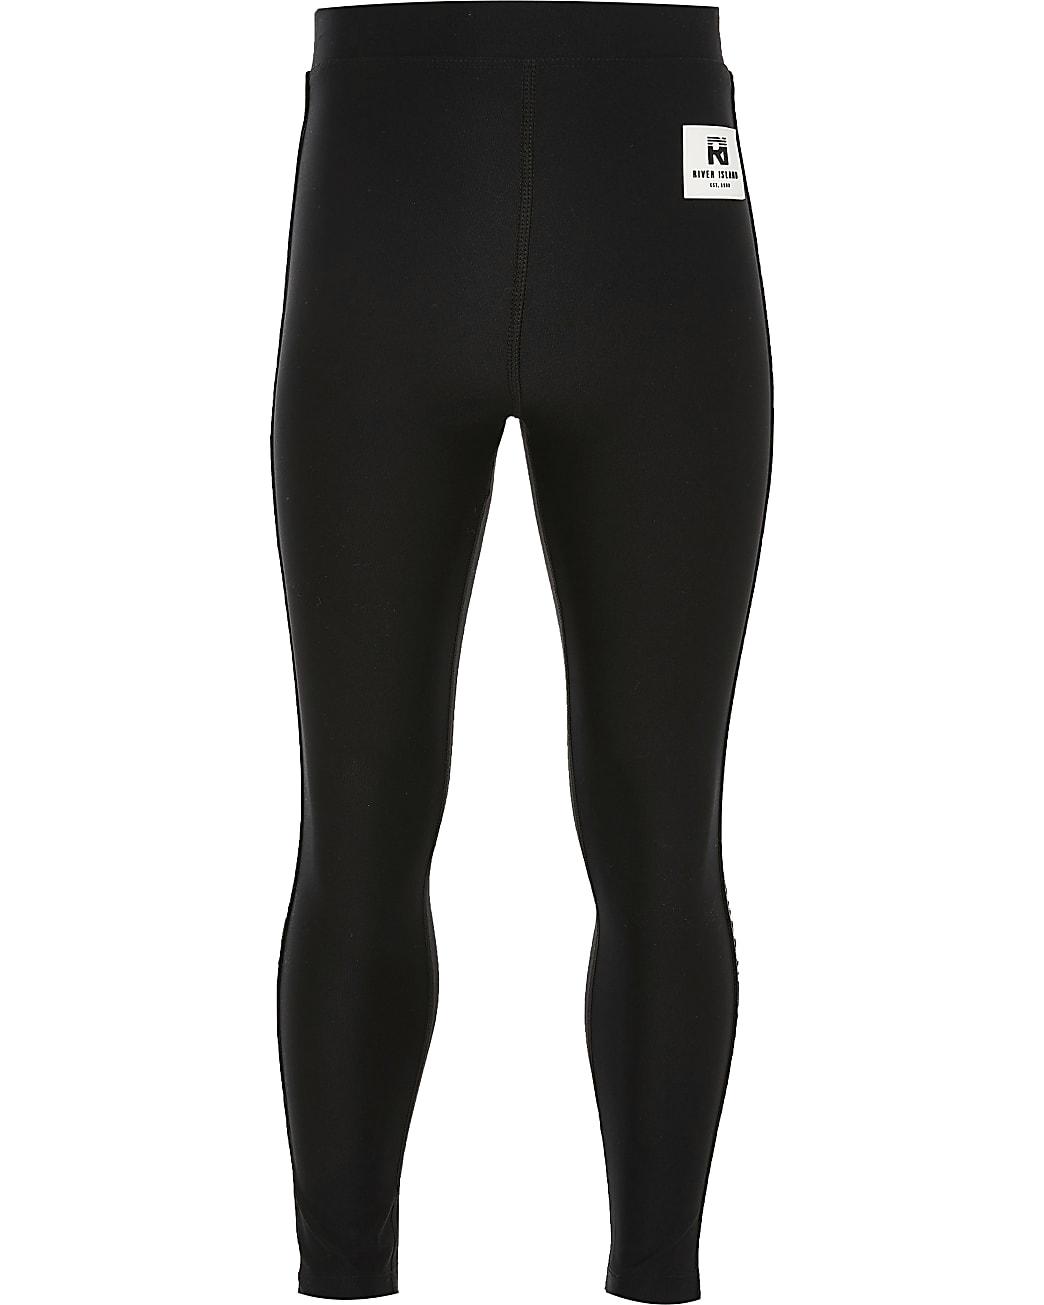 Girls black RI active leggings